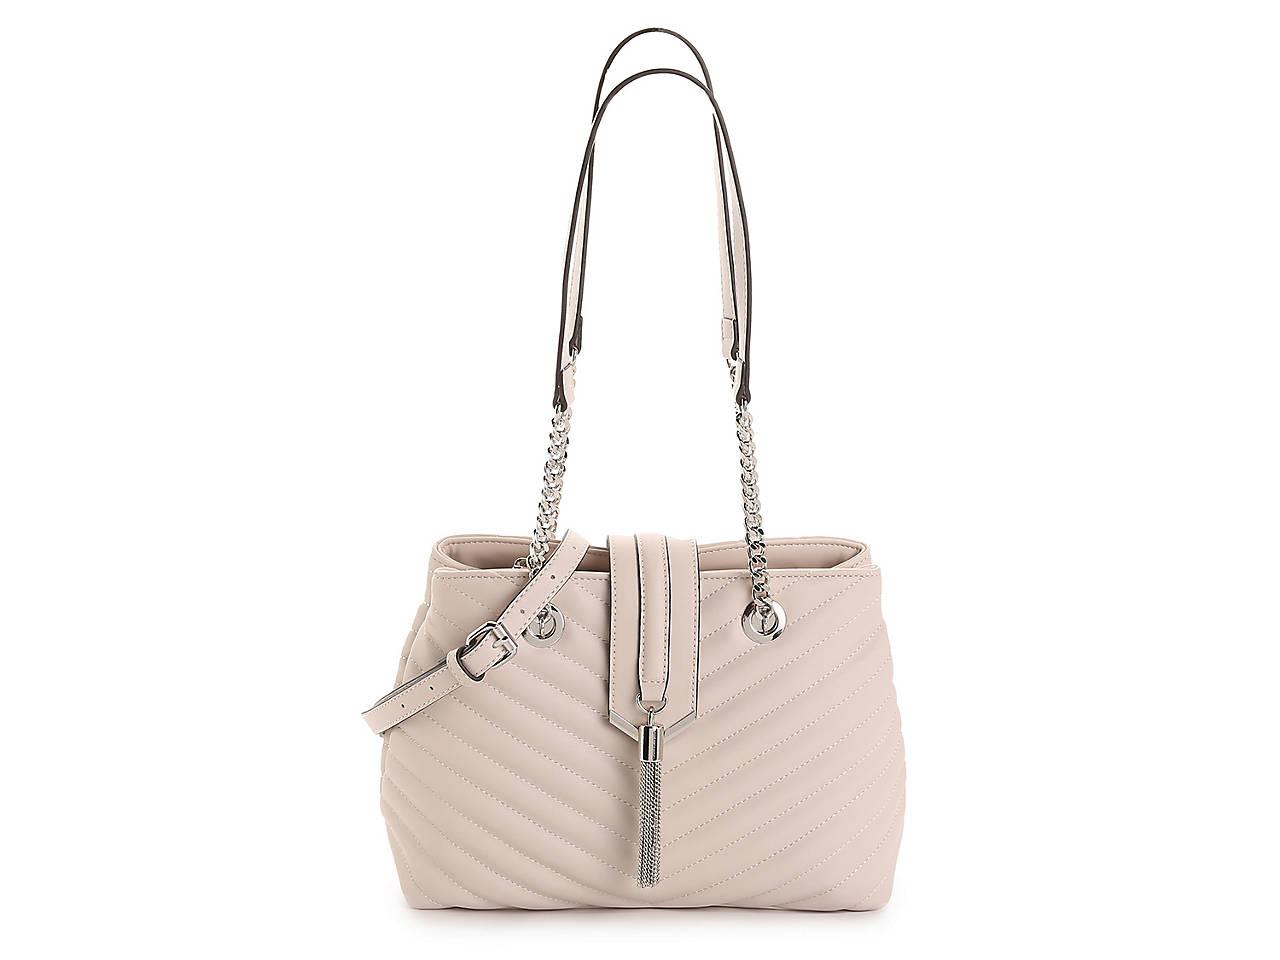 46707a5d0b Aldo Maewiel Satchel Women's Handbags & Accessories | DSW